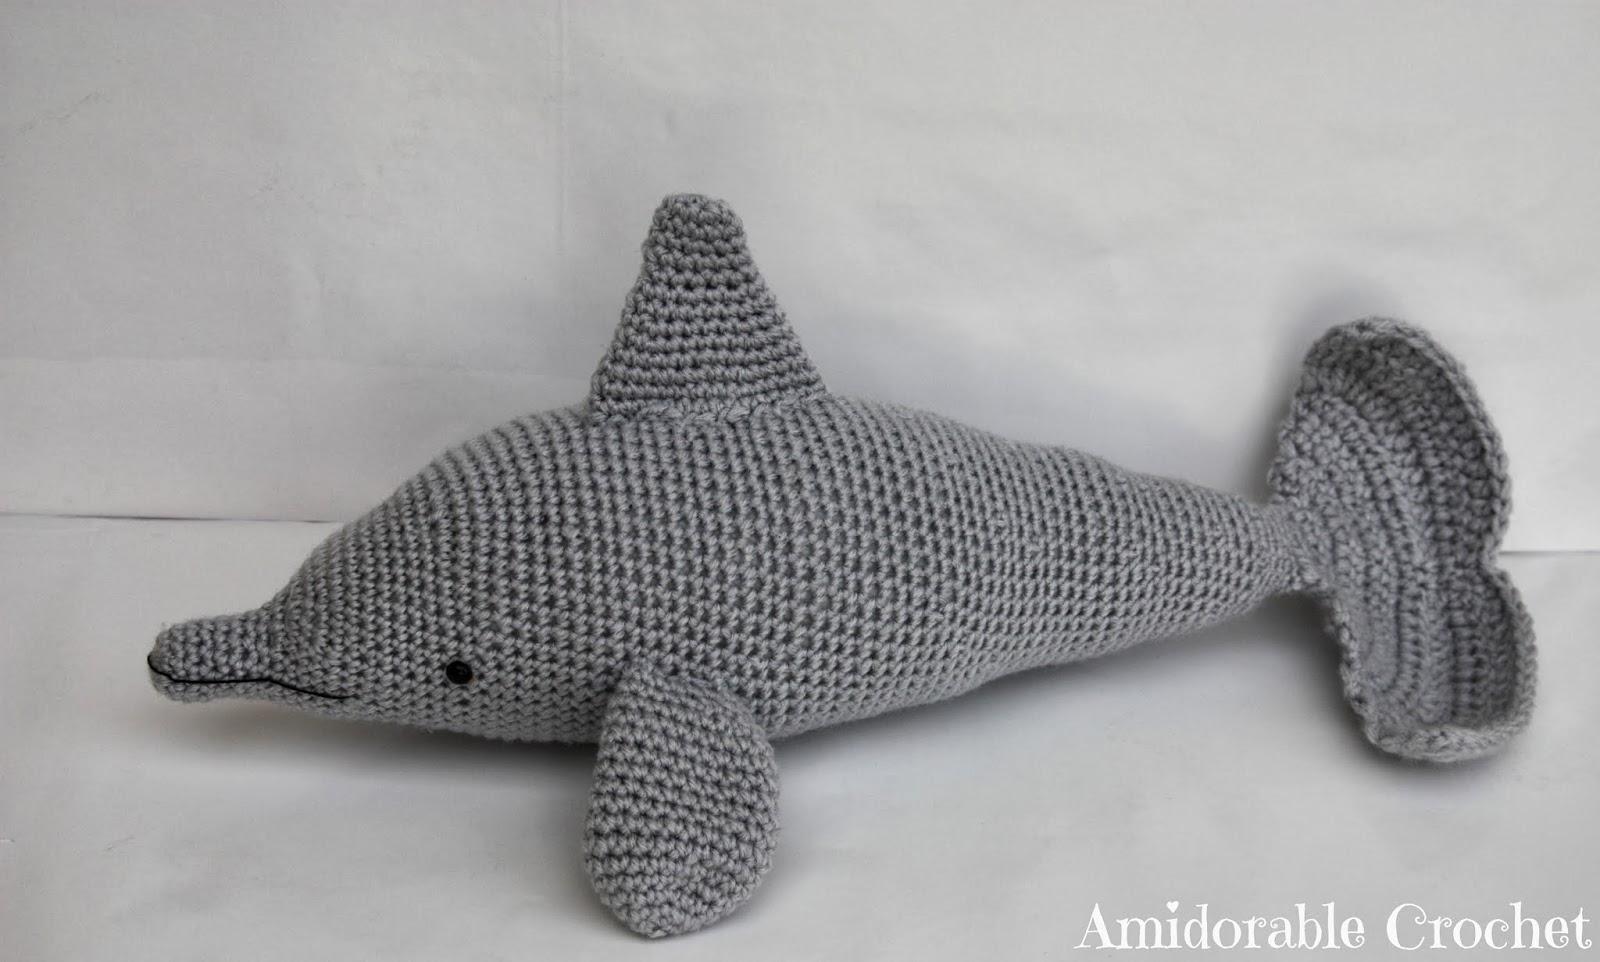 Crochet Amigurumi Dolphin Pattern : A[mi]dorable Crochet: Dolphin Pattern